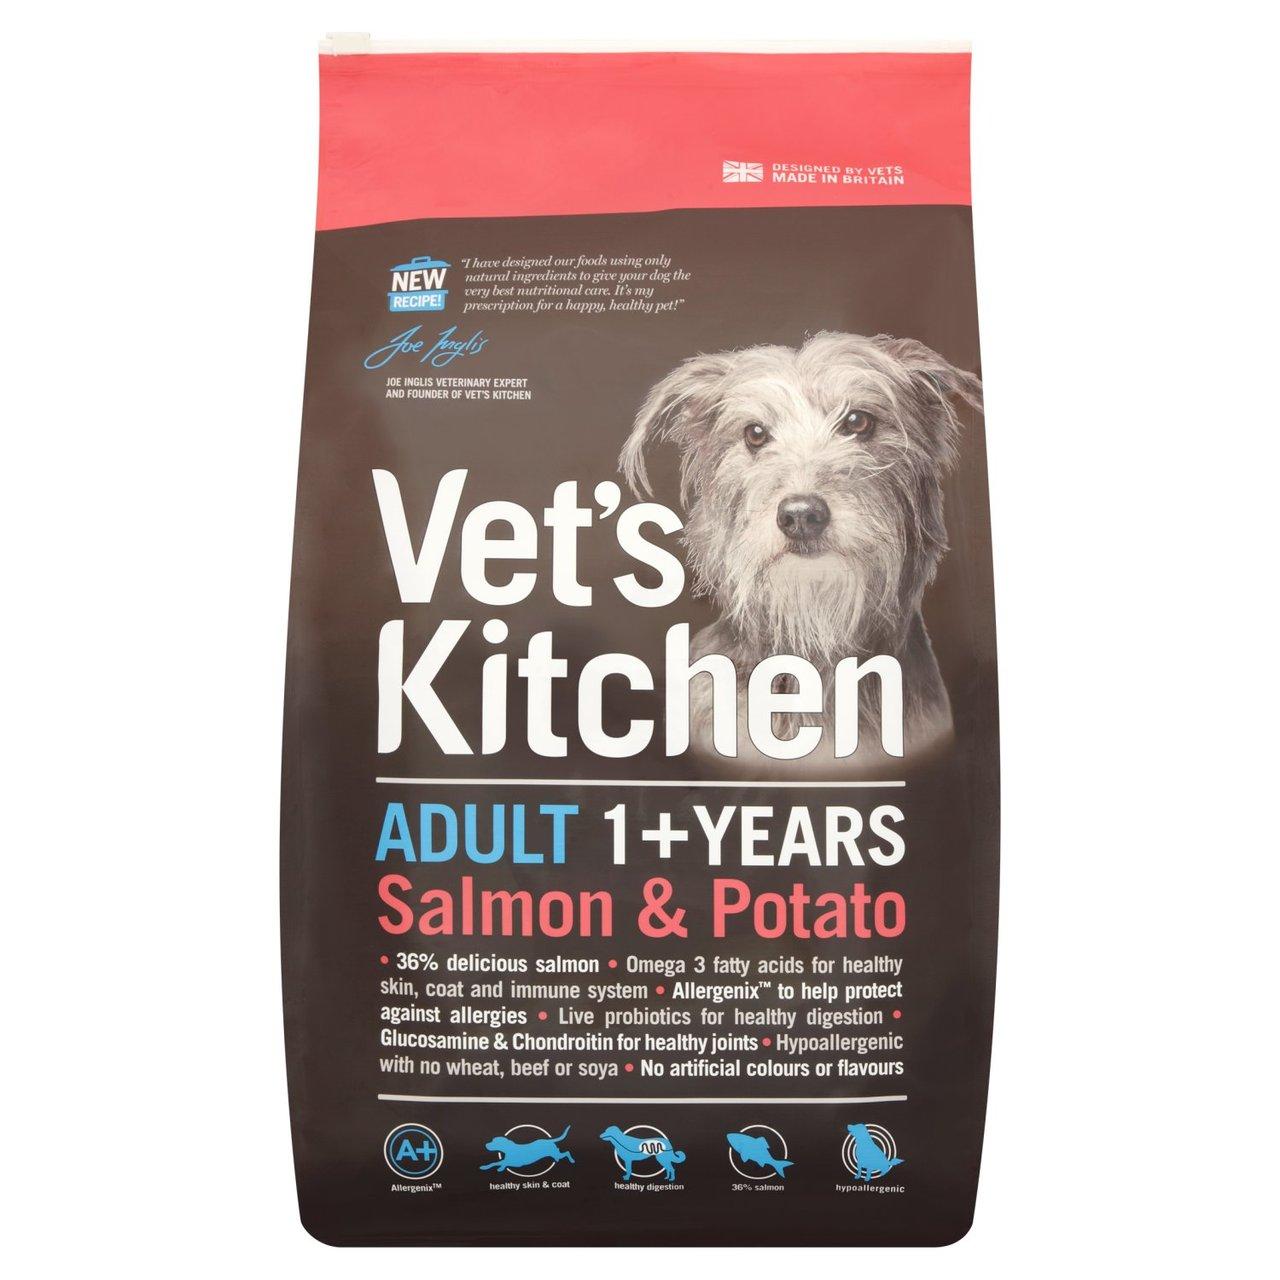 An image of Vets Kitchen Adult Dog Salmon & Potato